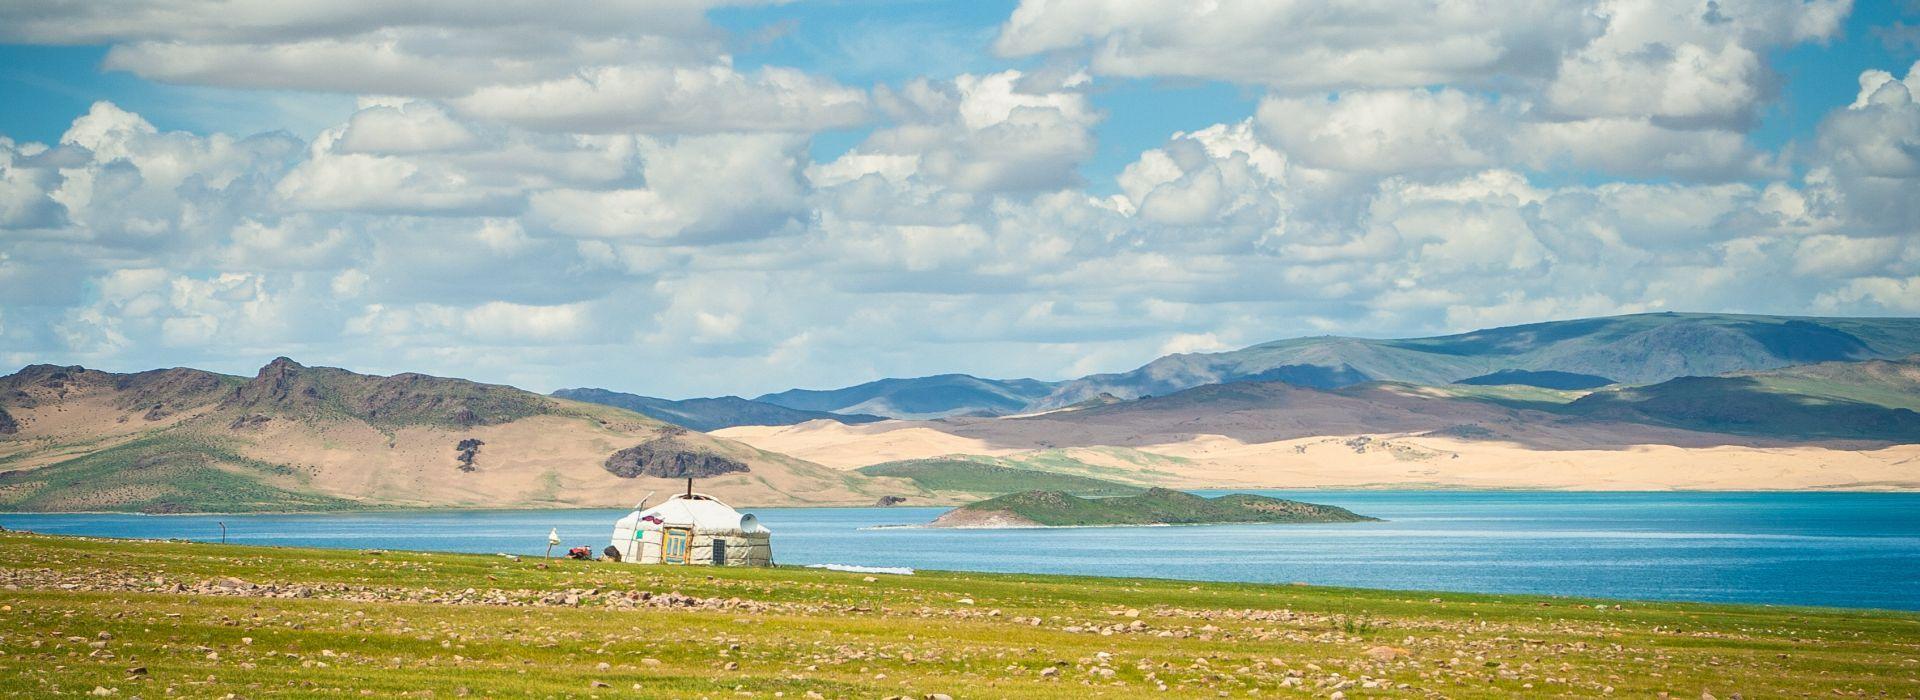 Mongolia Tours and Trips to Mongolia